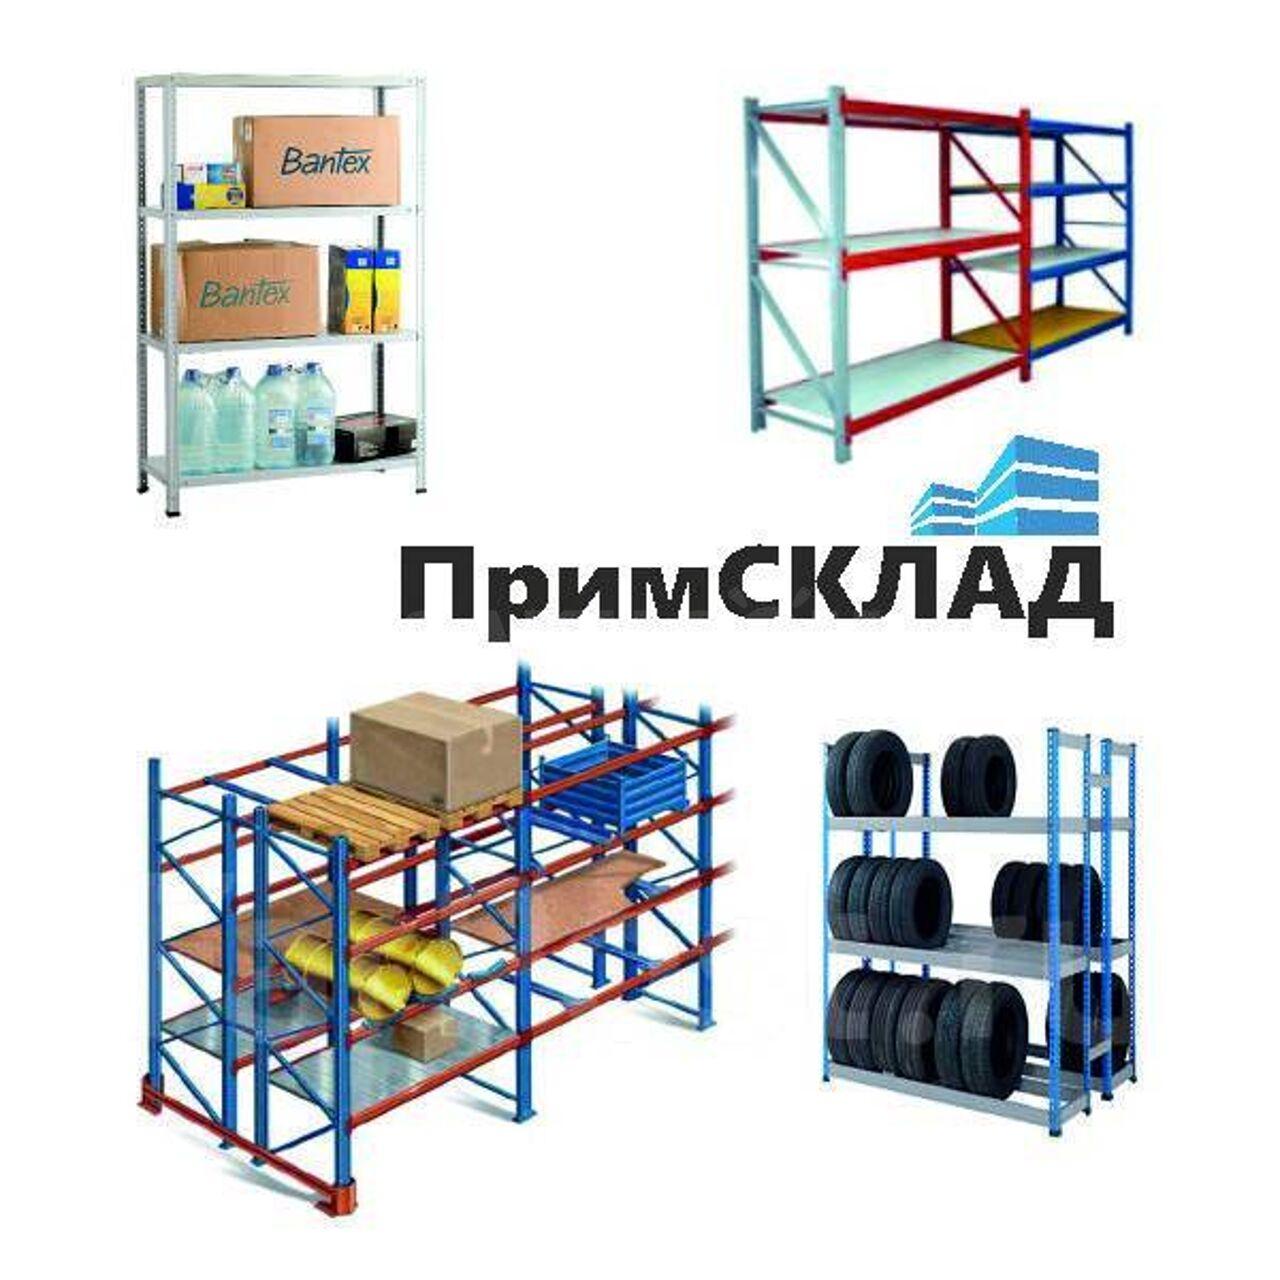 Байкал транс южно сахалинск